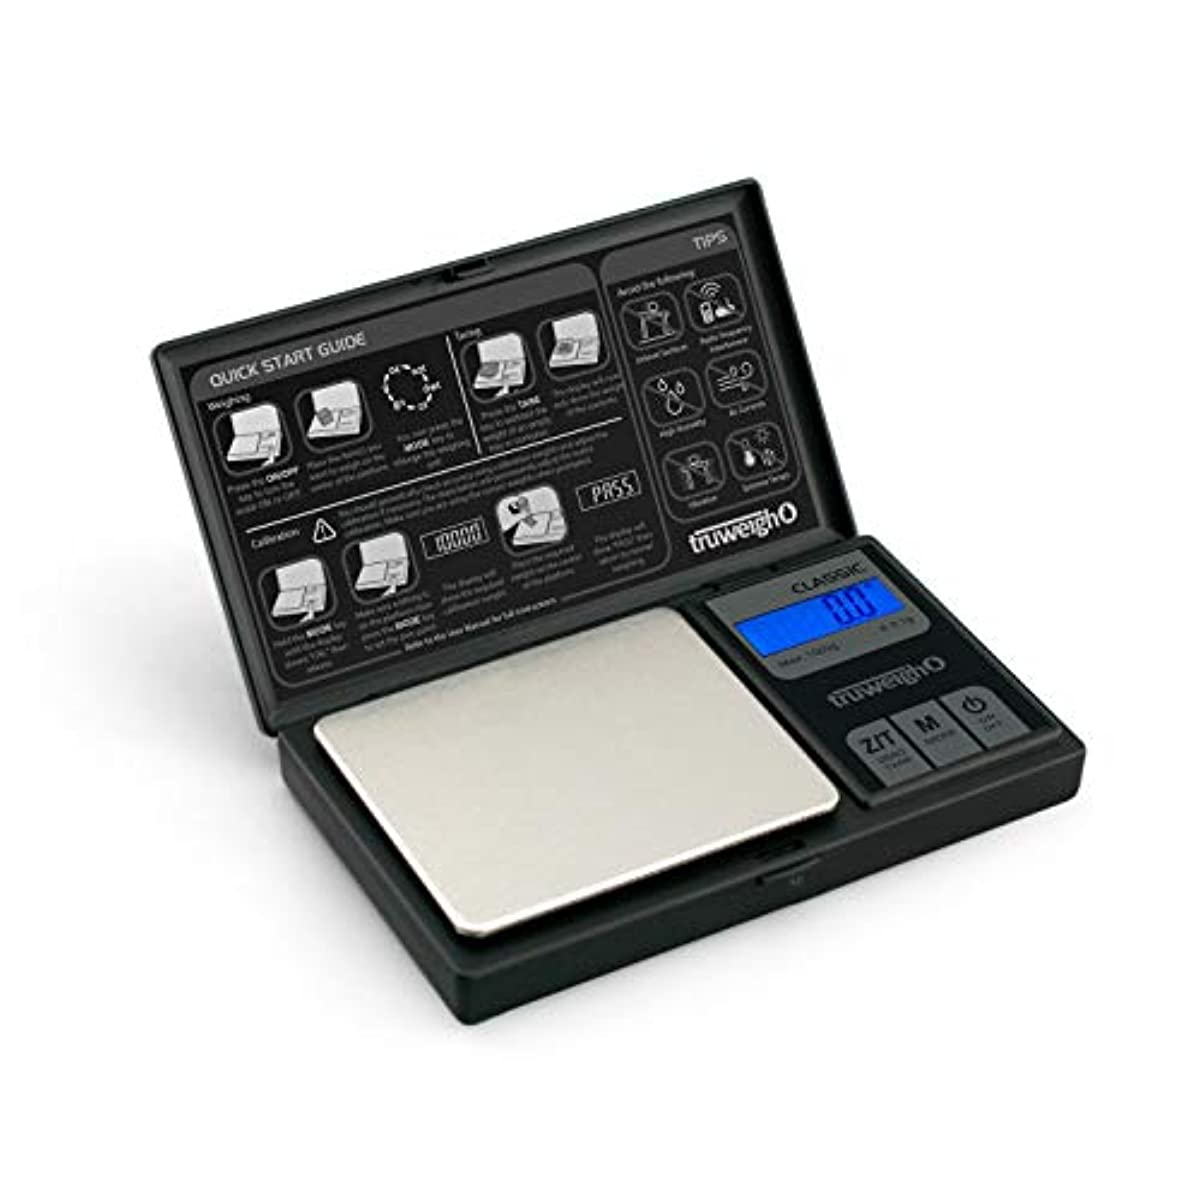 CLASSIC Digital Mini Scale 1000g x 0.1g Black